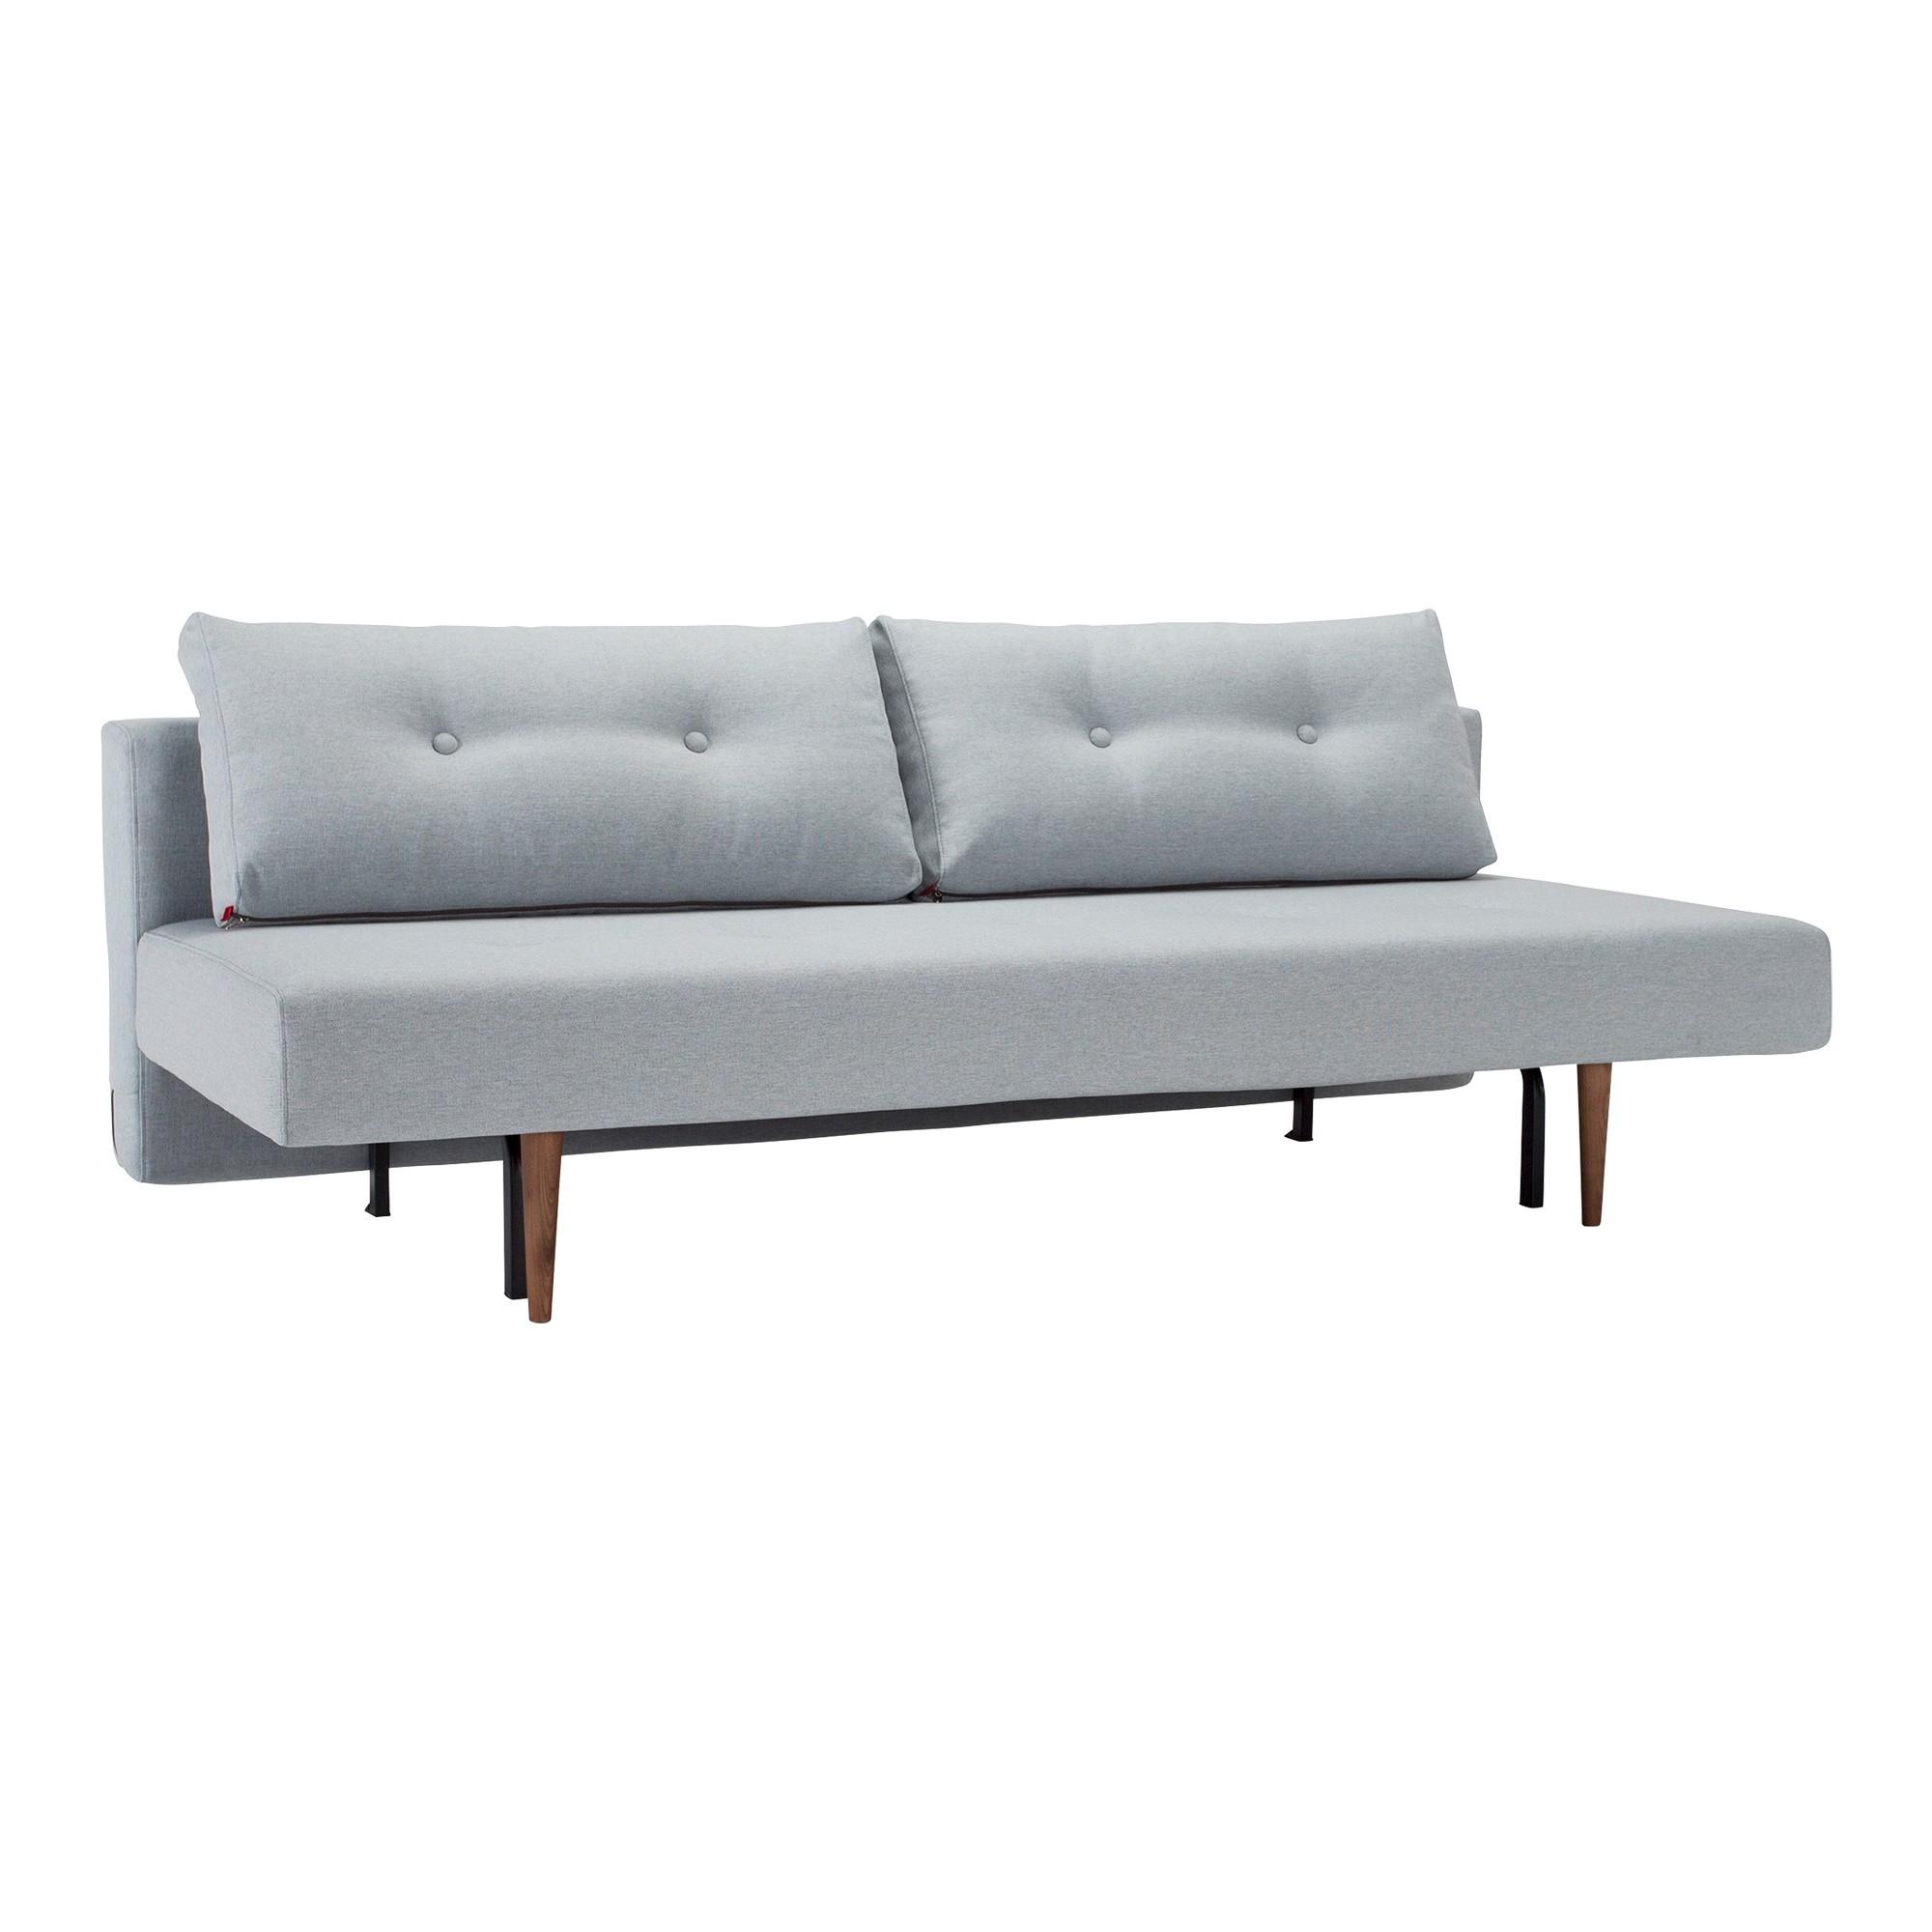 - Innovation Recast Plus Sofa Bed Legs Dark Wood 200x96cm